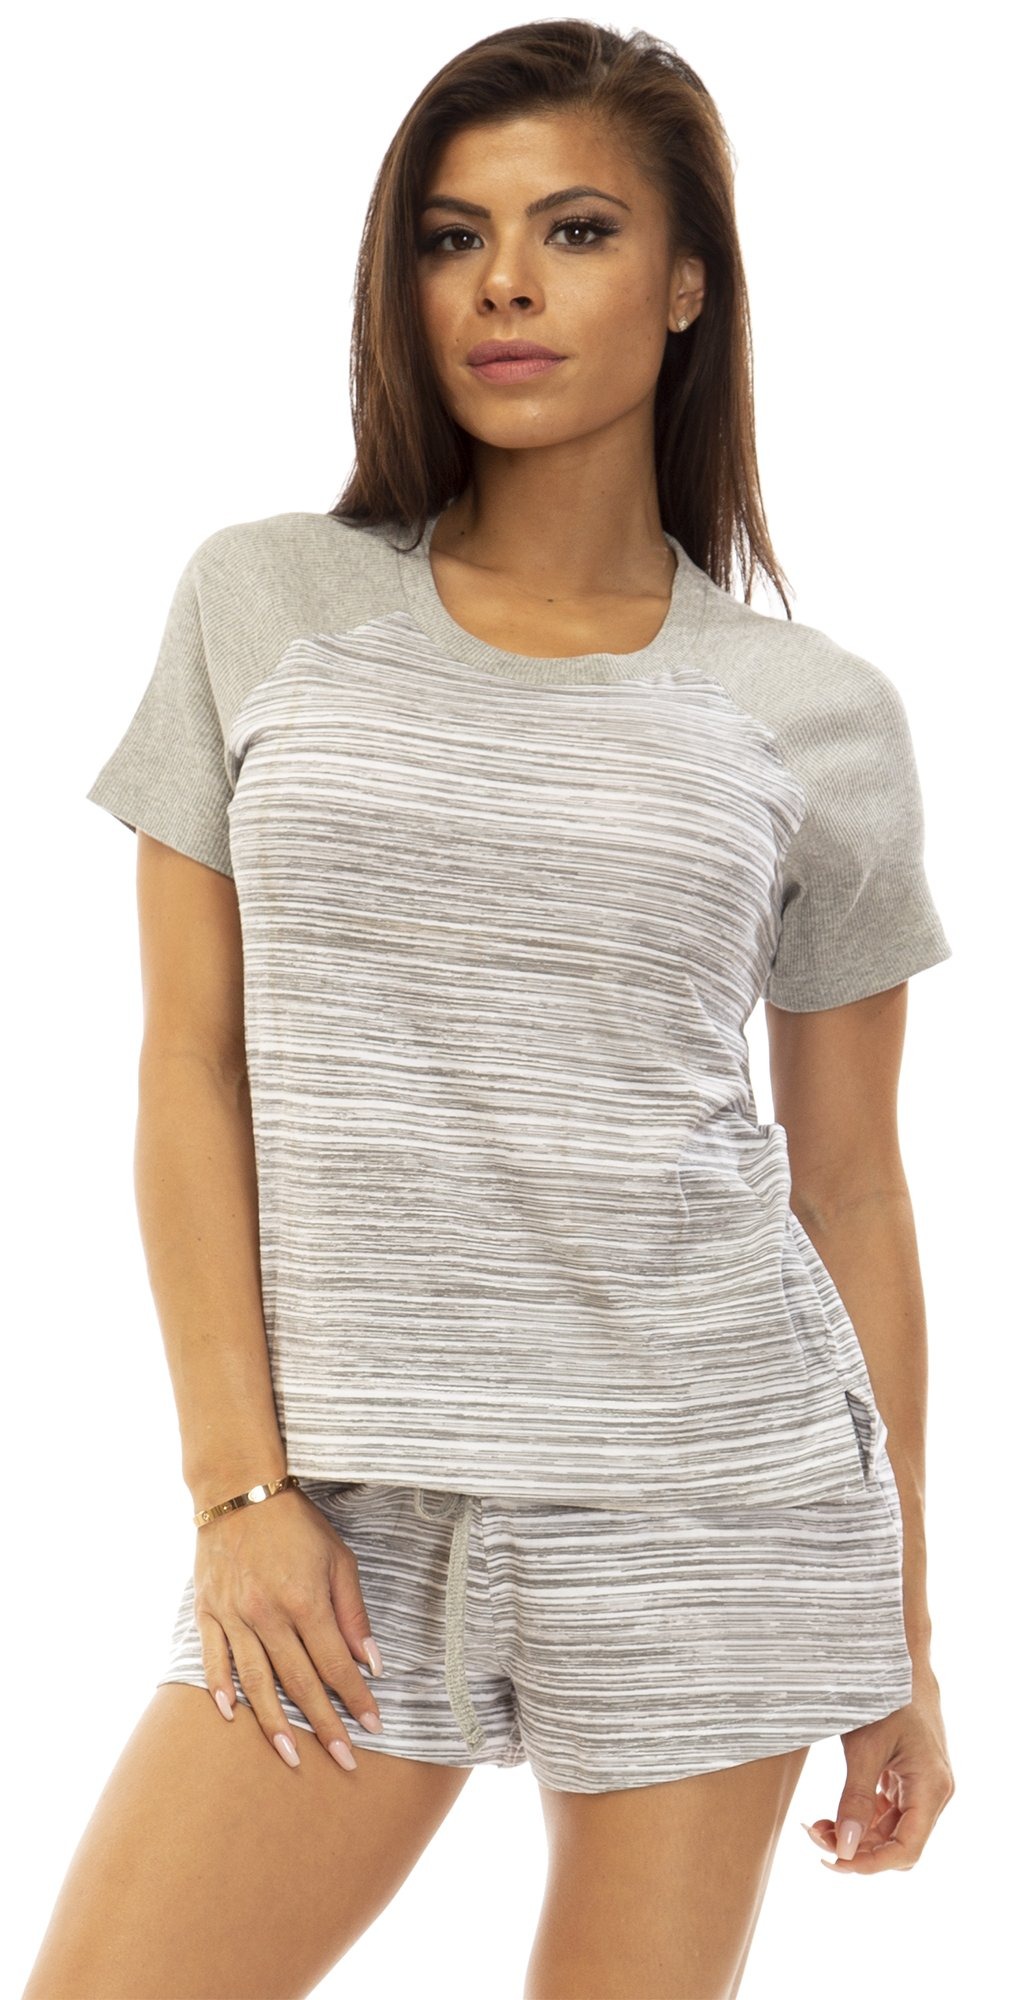 IZOD (6644IZ) Womens Womens 100% Cotton Raglan Sleeve Pajama Lounge Short Set Size: XLarge in Gray (020)